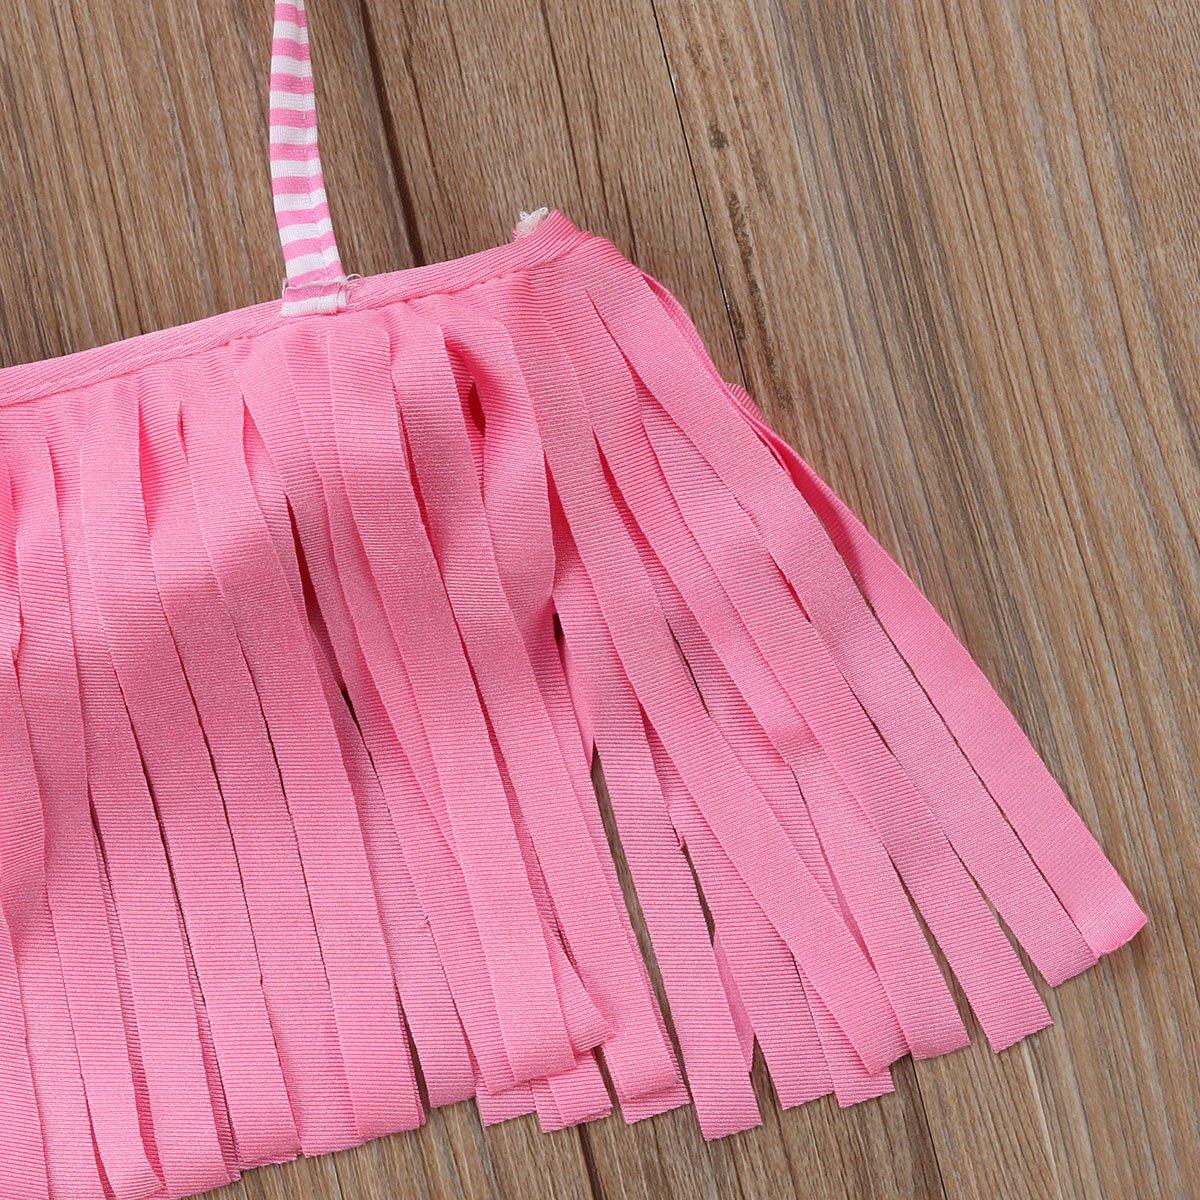 Girls Adjustable Tassel Bikini Set Kids Girl Halter Swimsuit Bathing Suit Little Girl Swimwear Beach Wear for 2-8 Years